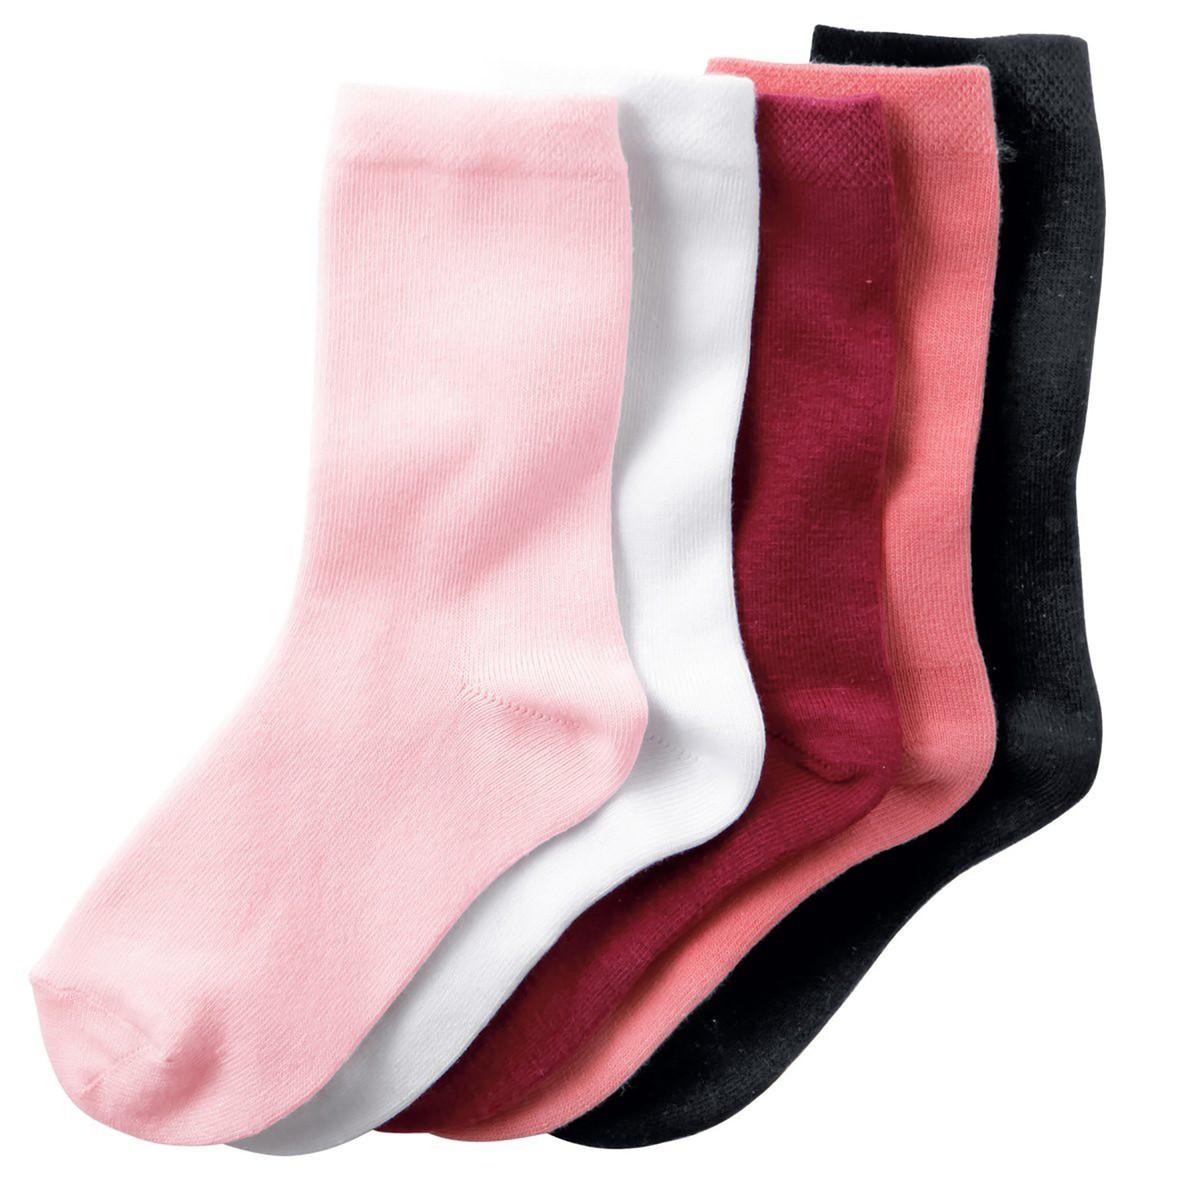 LA REDOUTE COLLECTIONS Κάλτσες Σετ 5 Τμχ - Glami.gr 9219a3893b9